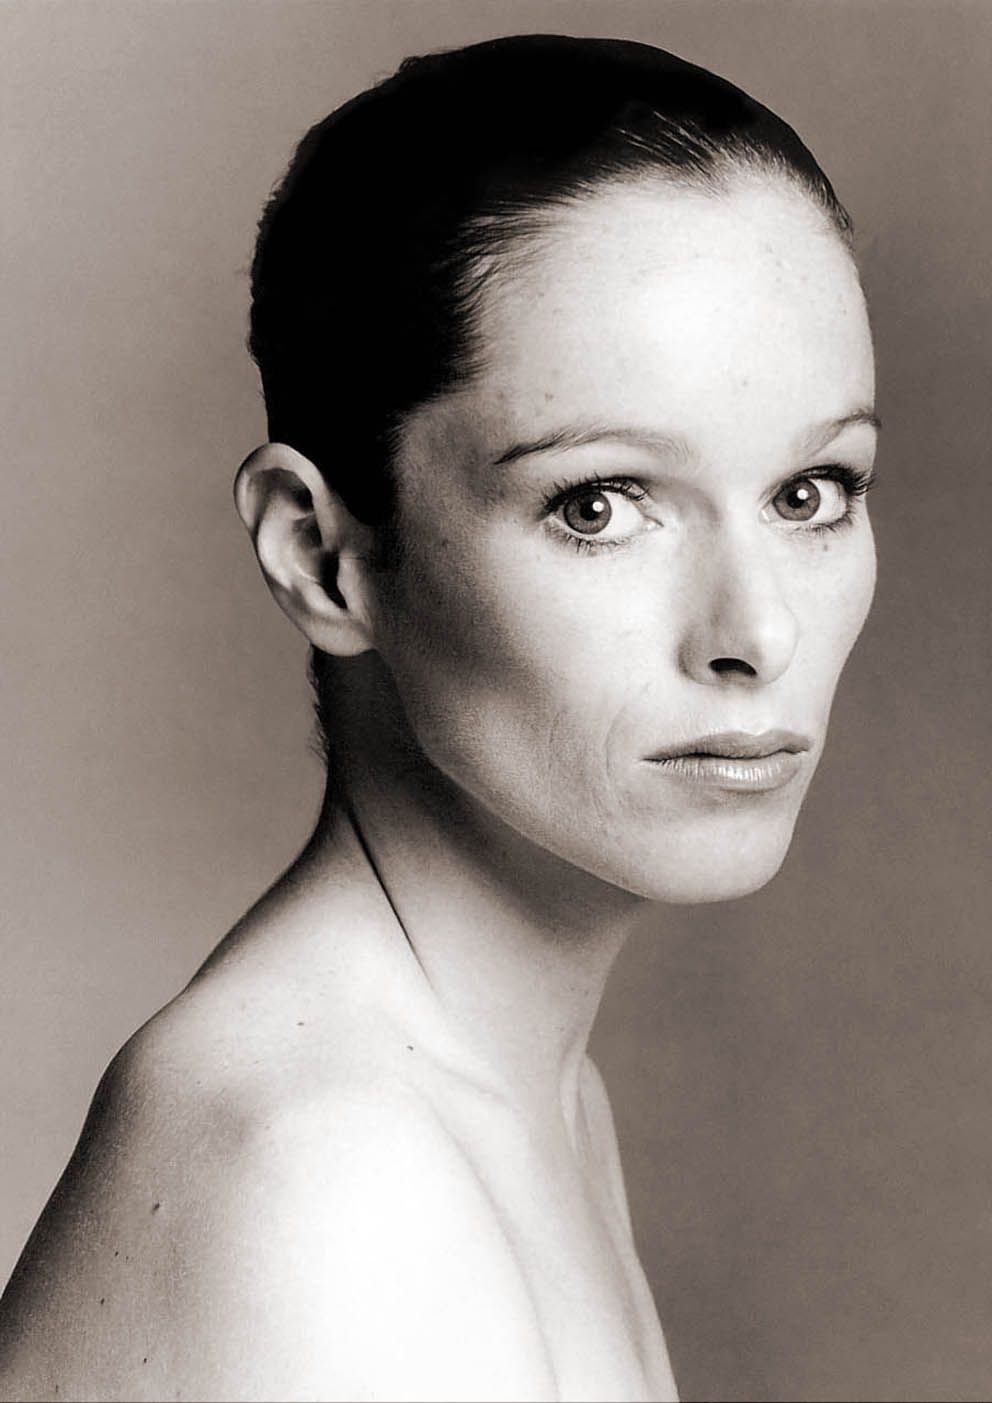 Forum on this topic: Patricia Dunn (actress), geraldine-chaplin-born-1944-born-in-santa/